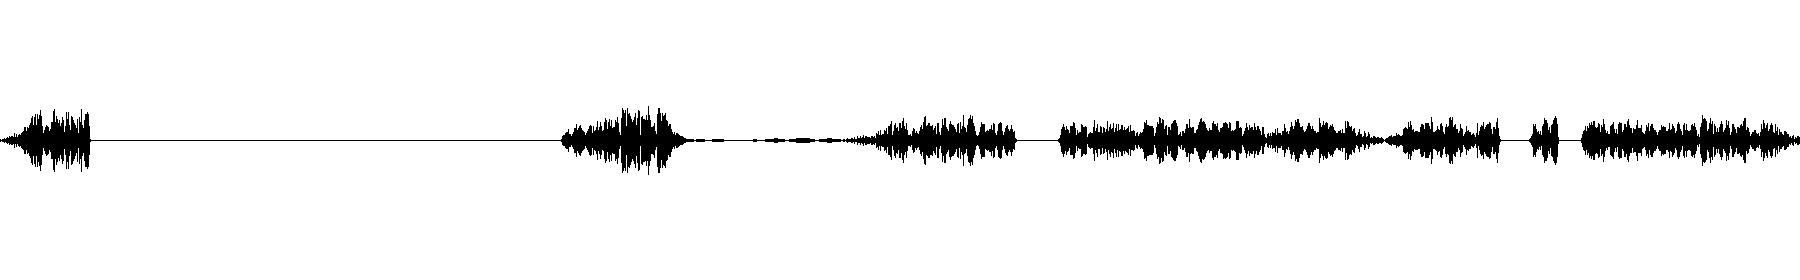 80 sp01